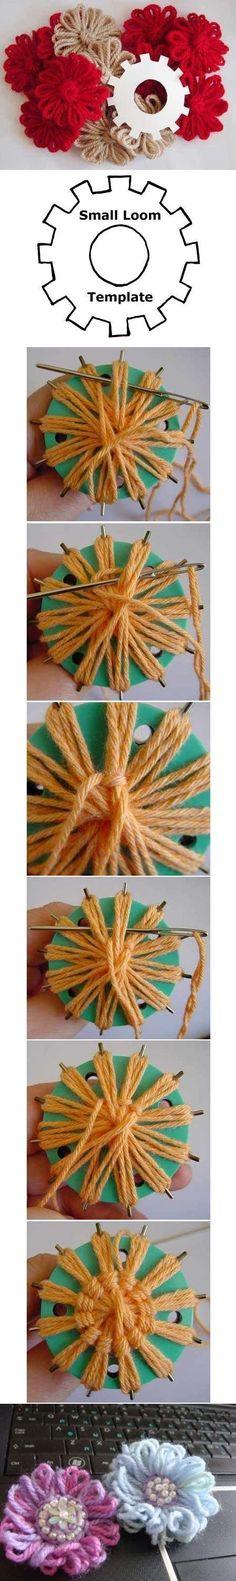 DIY Gear Flower DIY Gear Flower...nice to add onto crochet project or crochet around